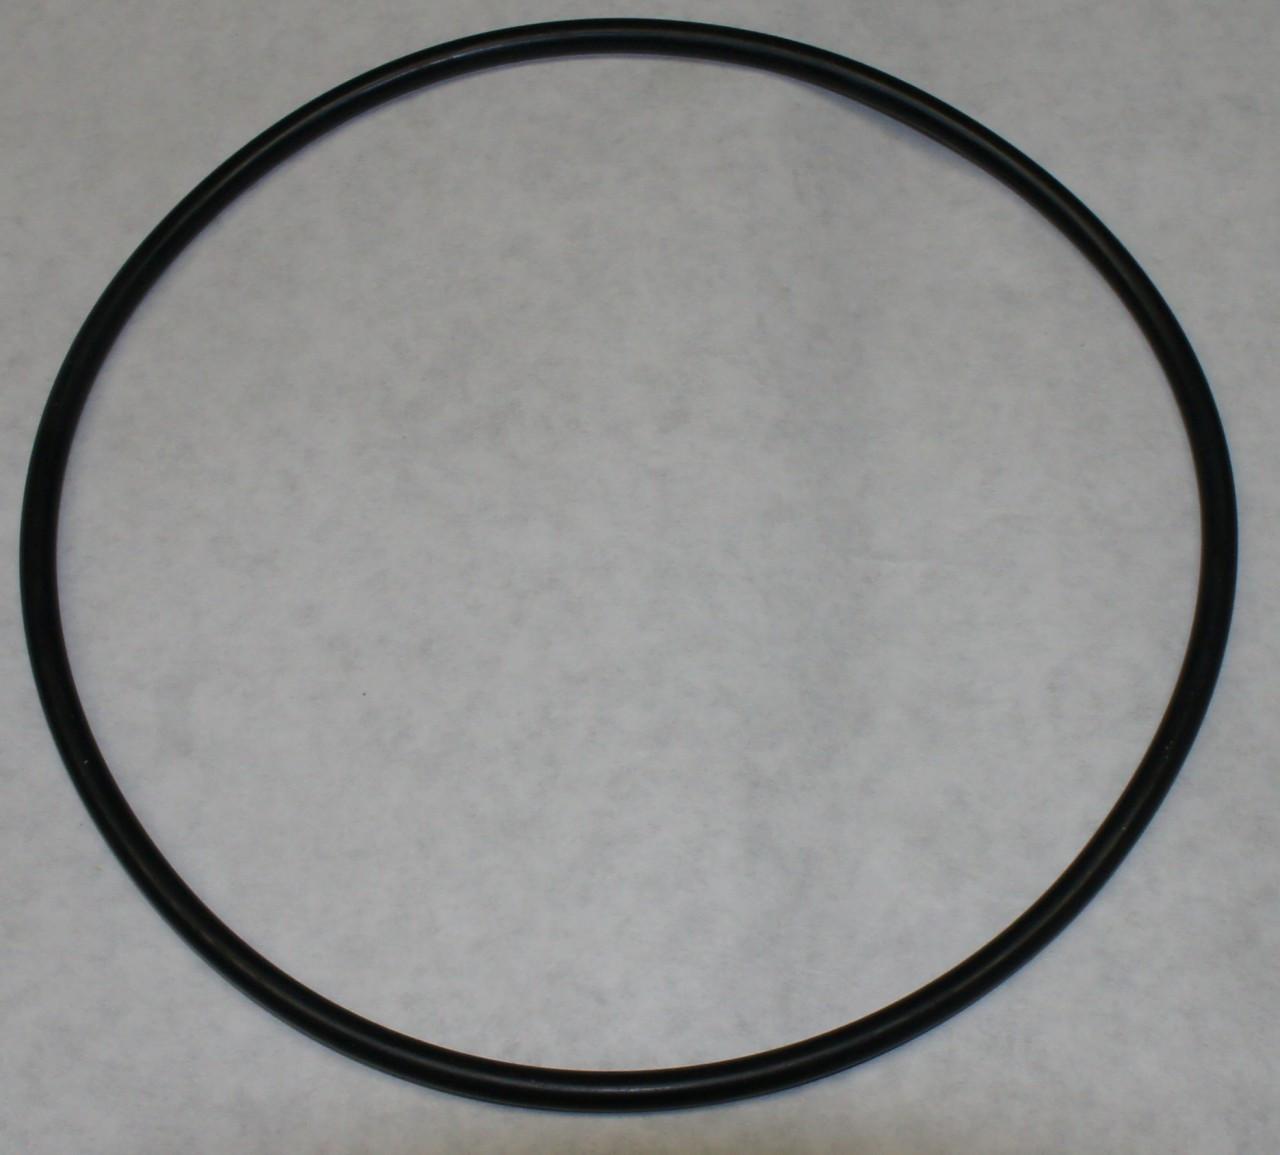 Rapid Stuffer Replacement O-Ring (Black) - SF150, SF260, SF350